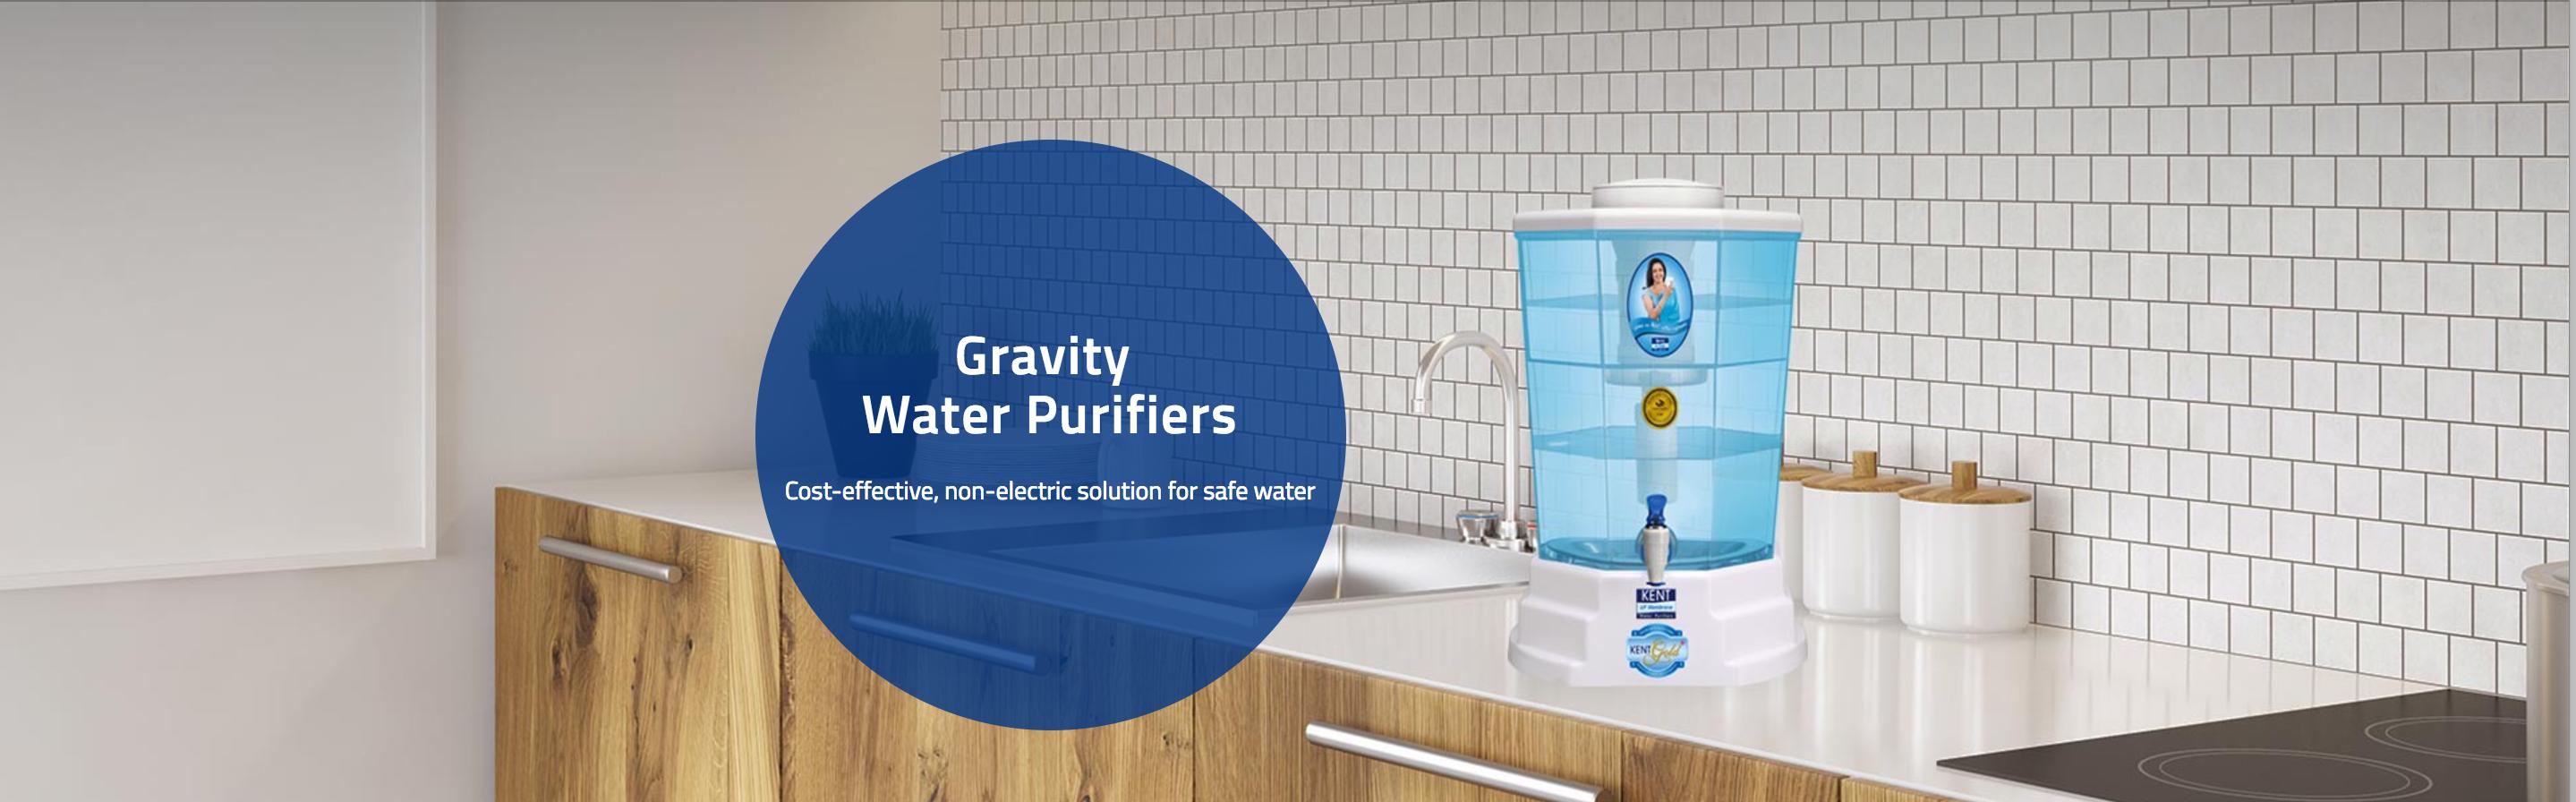 Gravity Water Purifiers